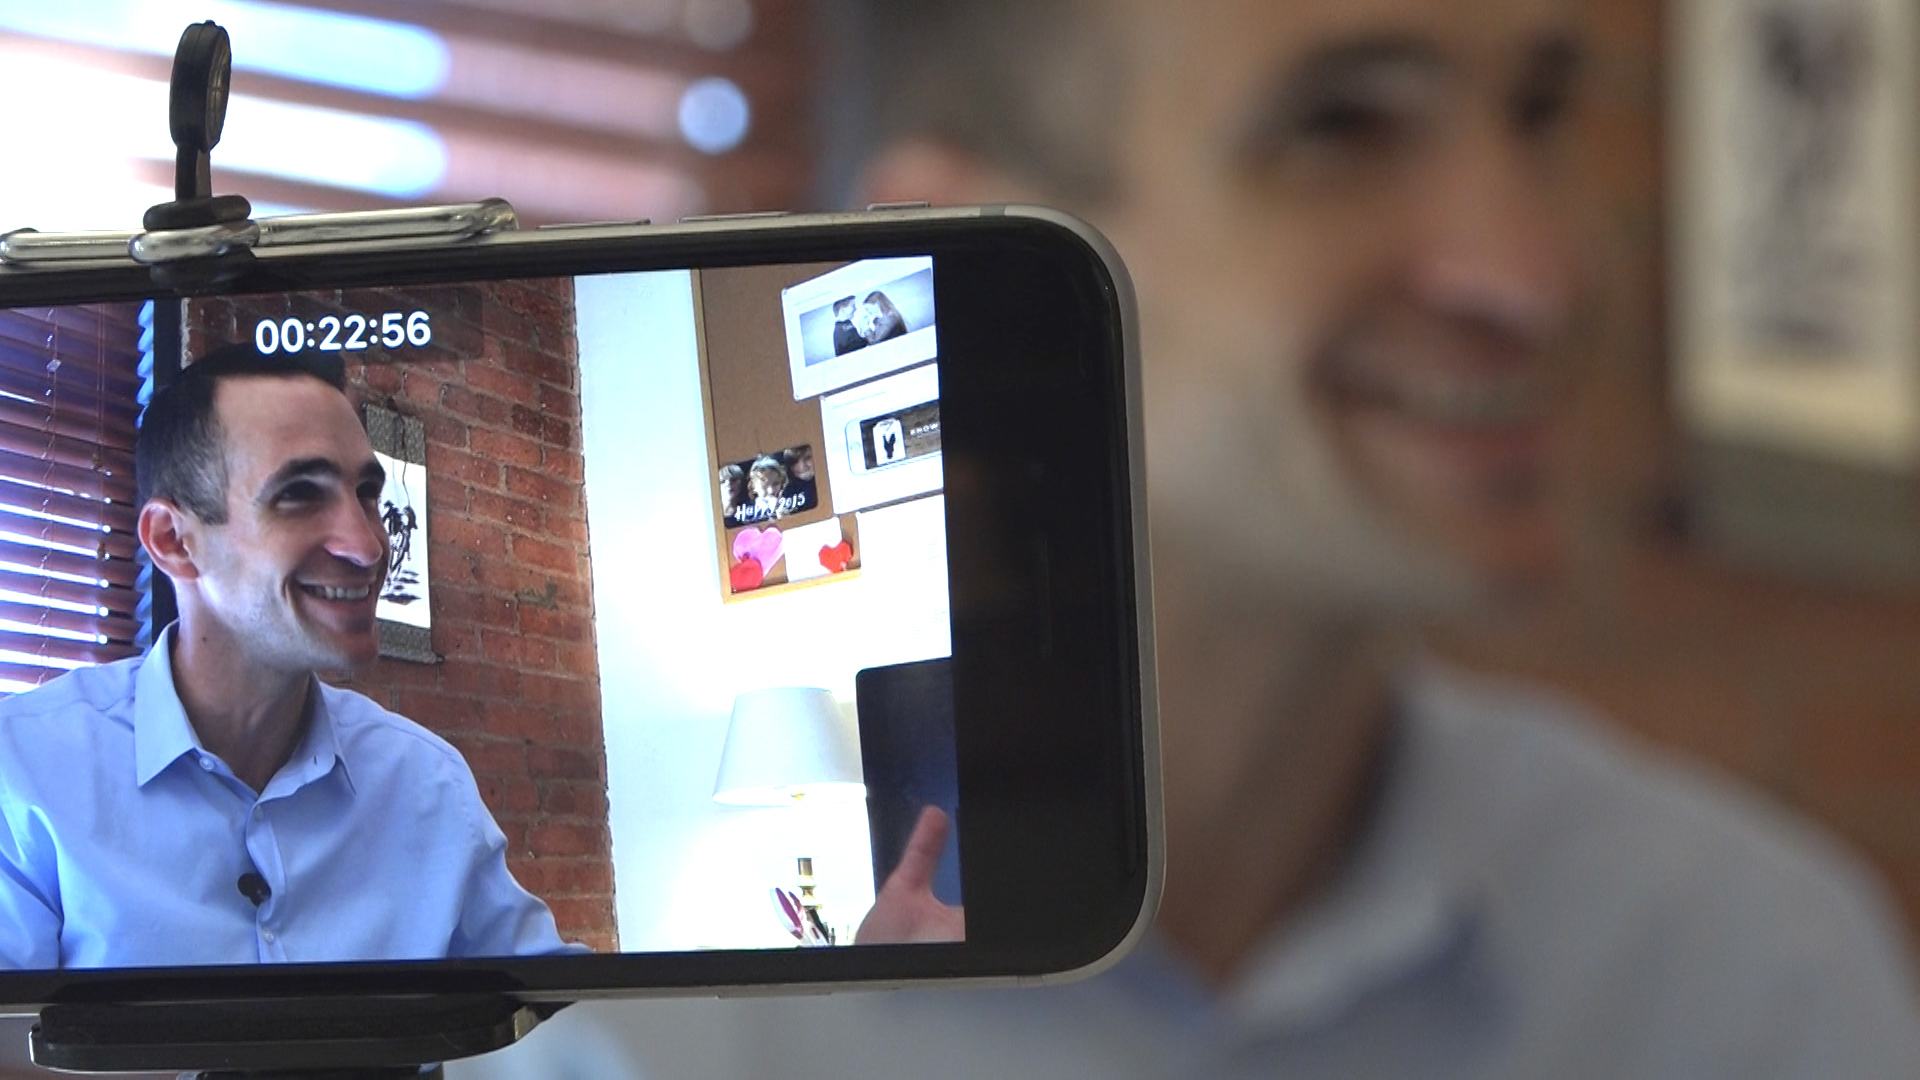 Nir Eyal on Bots, VR, and Facebook's Next Big Move